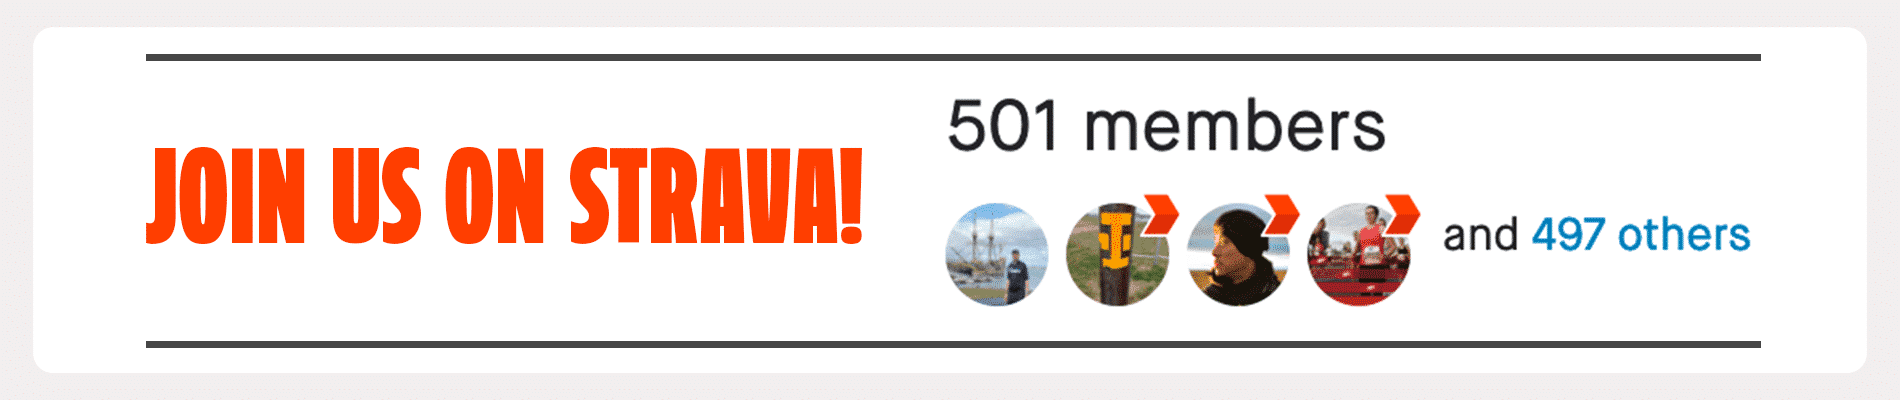 Join the Marathon Sports Strava Group